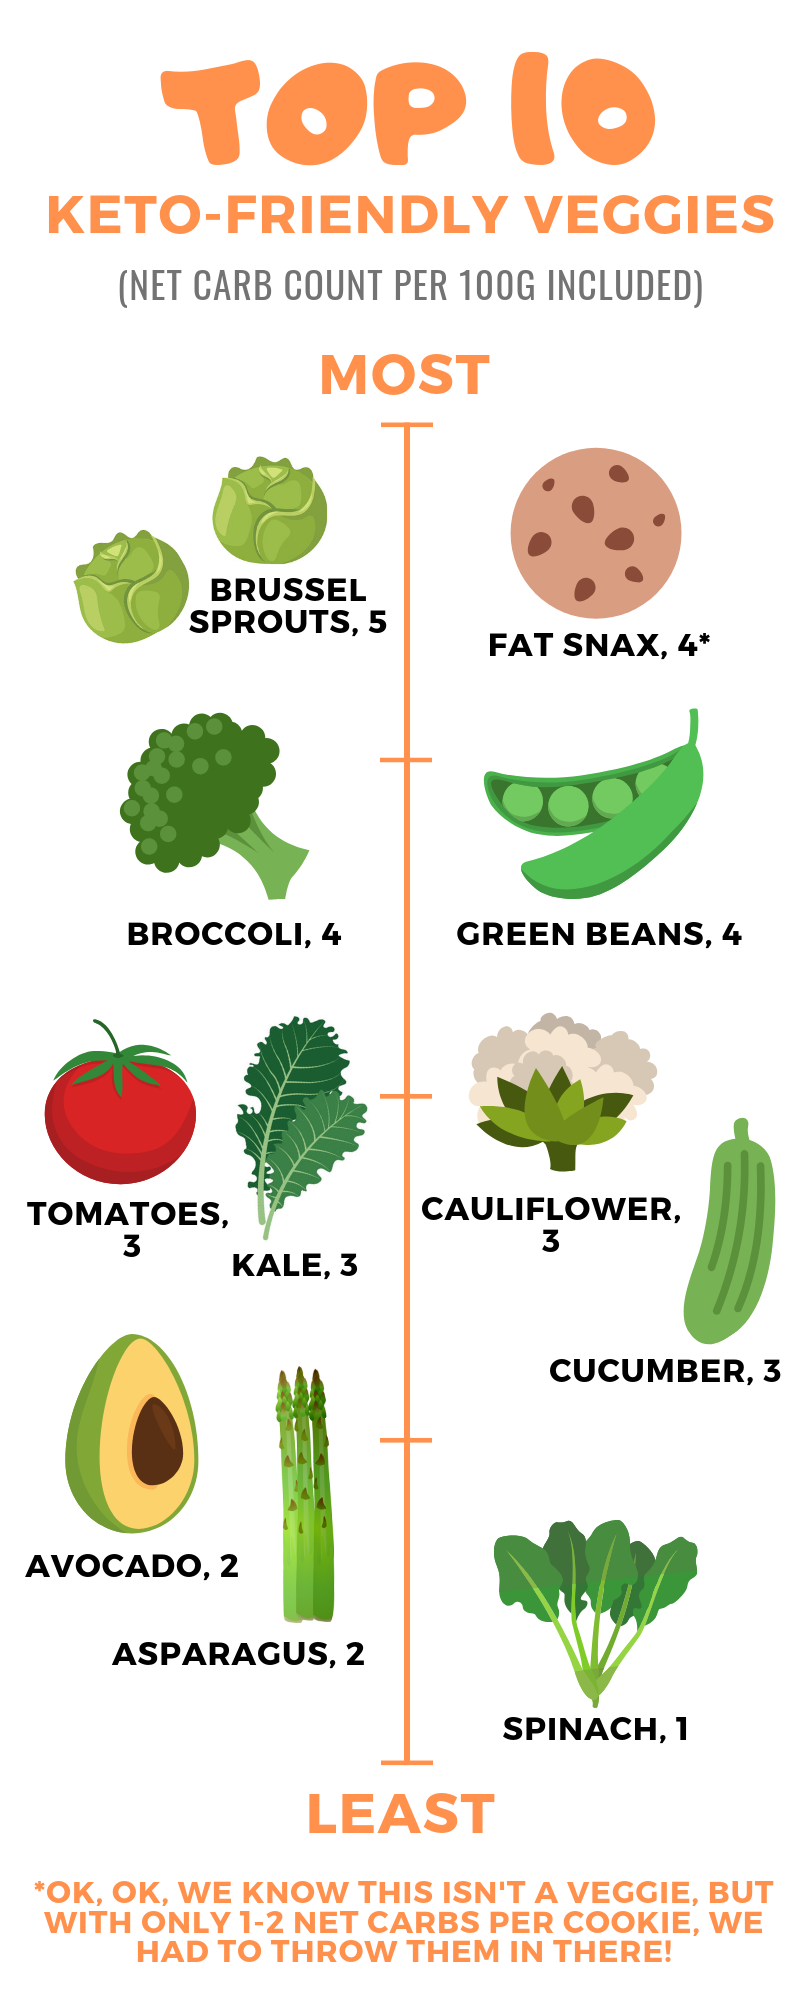 Top 10 Keto Friendly Veggies Keto Friendly Vegetables Best Low Carb Snacks Carbs